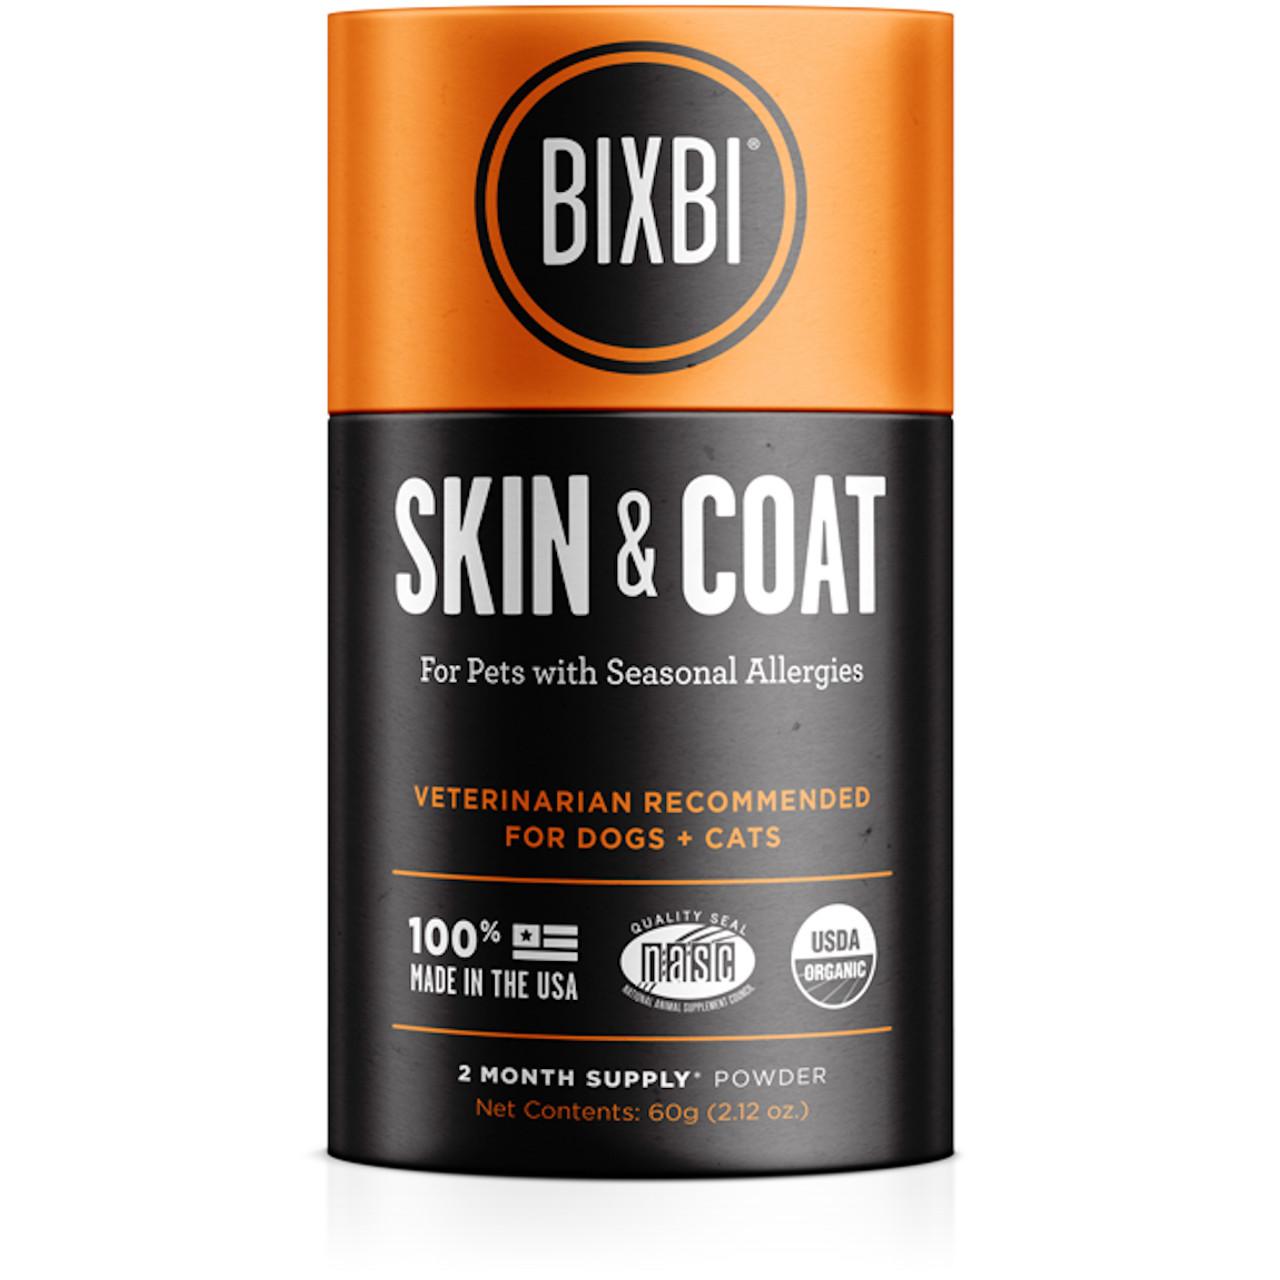 Bixbi Skin & Coat Supplement for Dogs & Cats